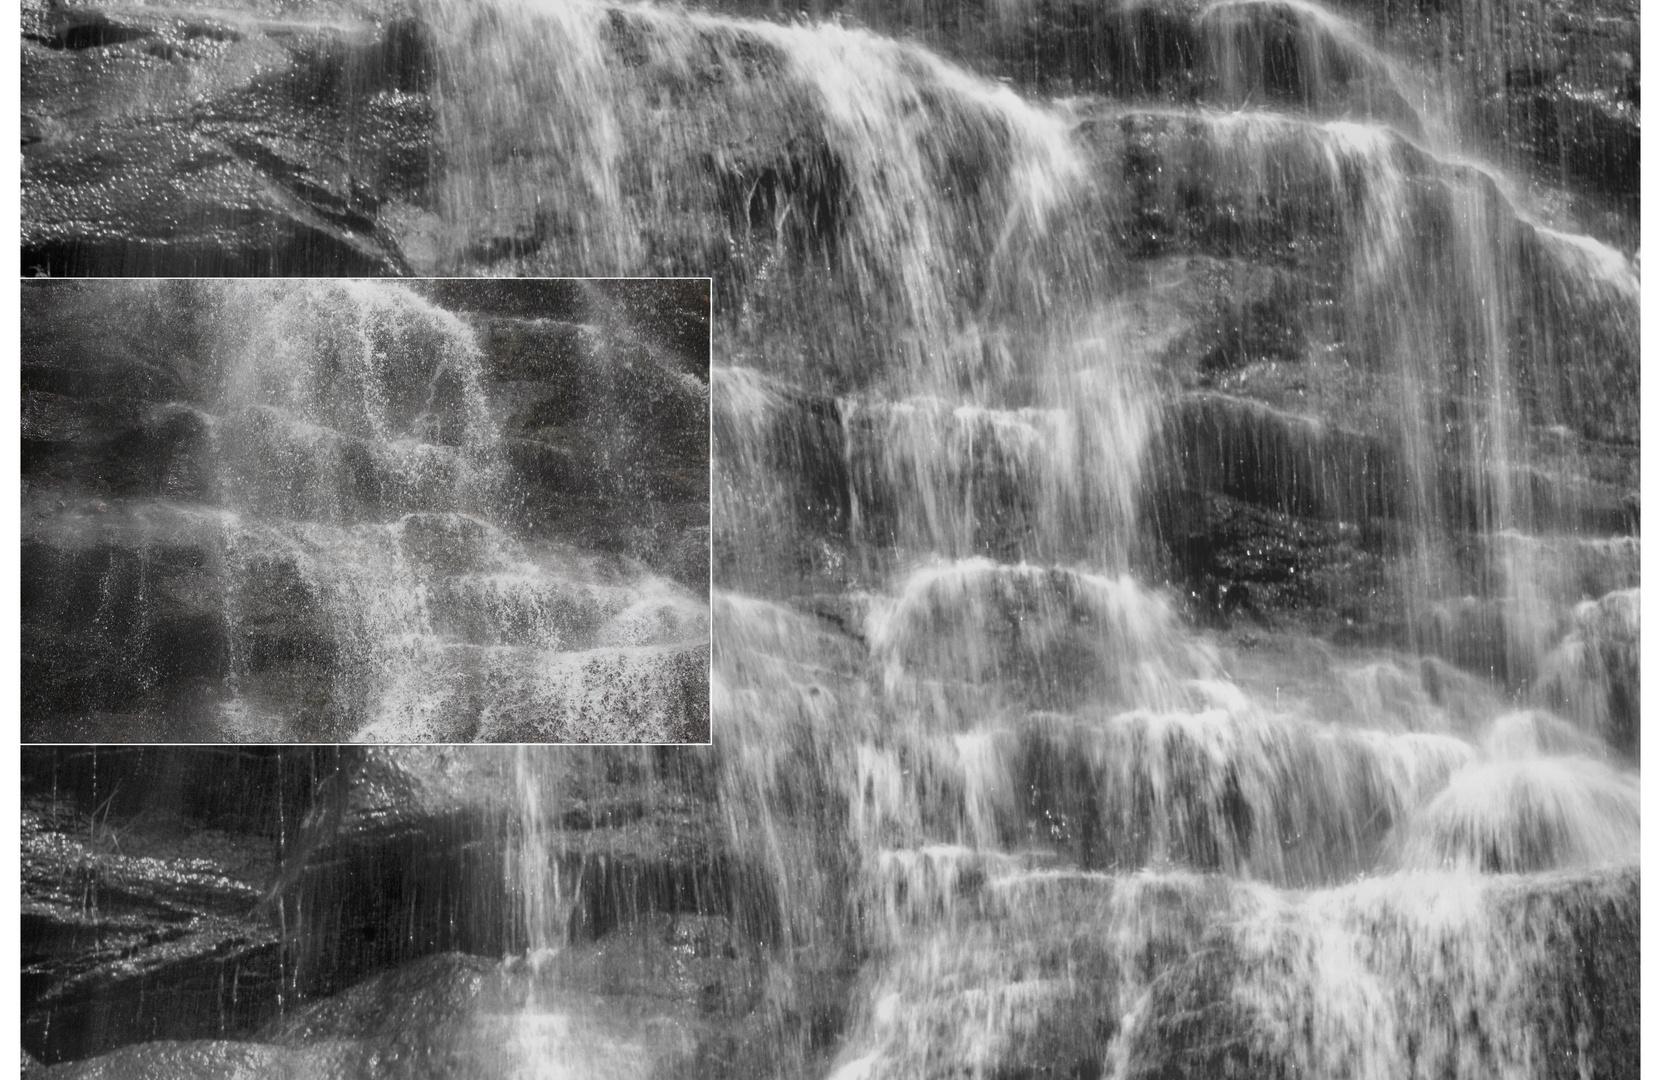 Tessin / Ticino 2010 Wasserfall Begnasco Variation